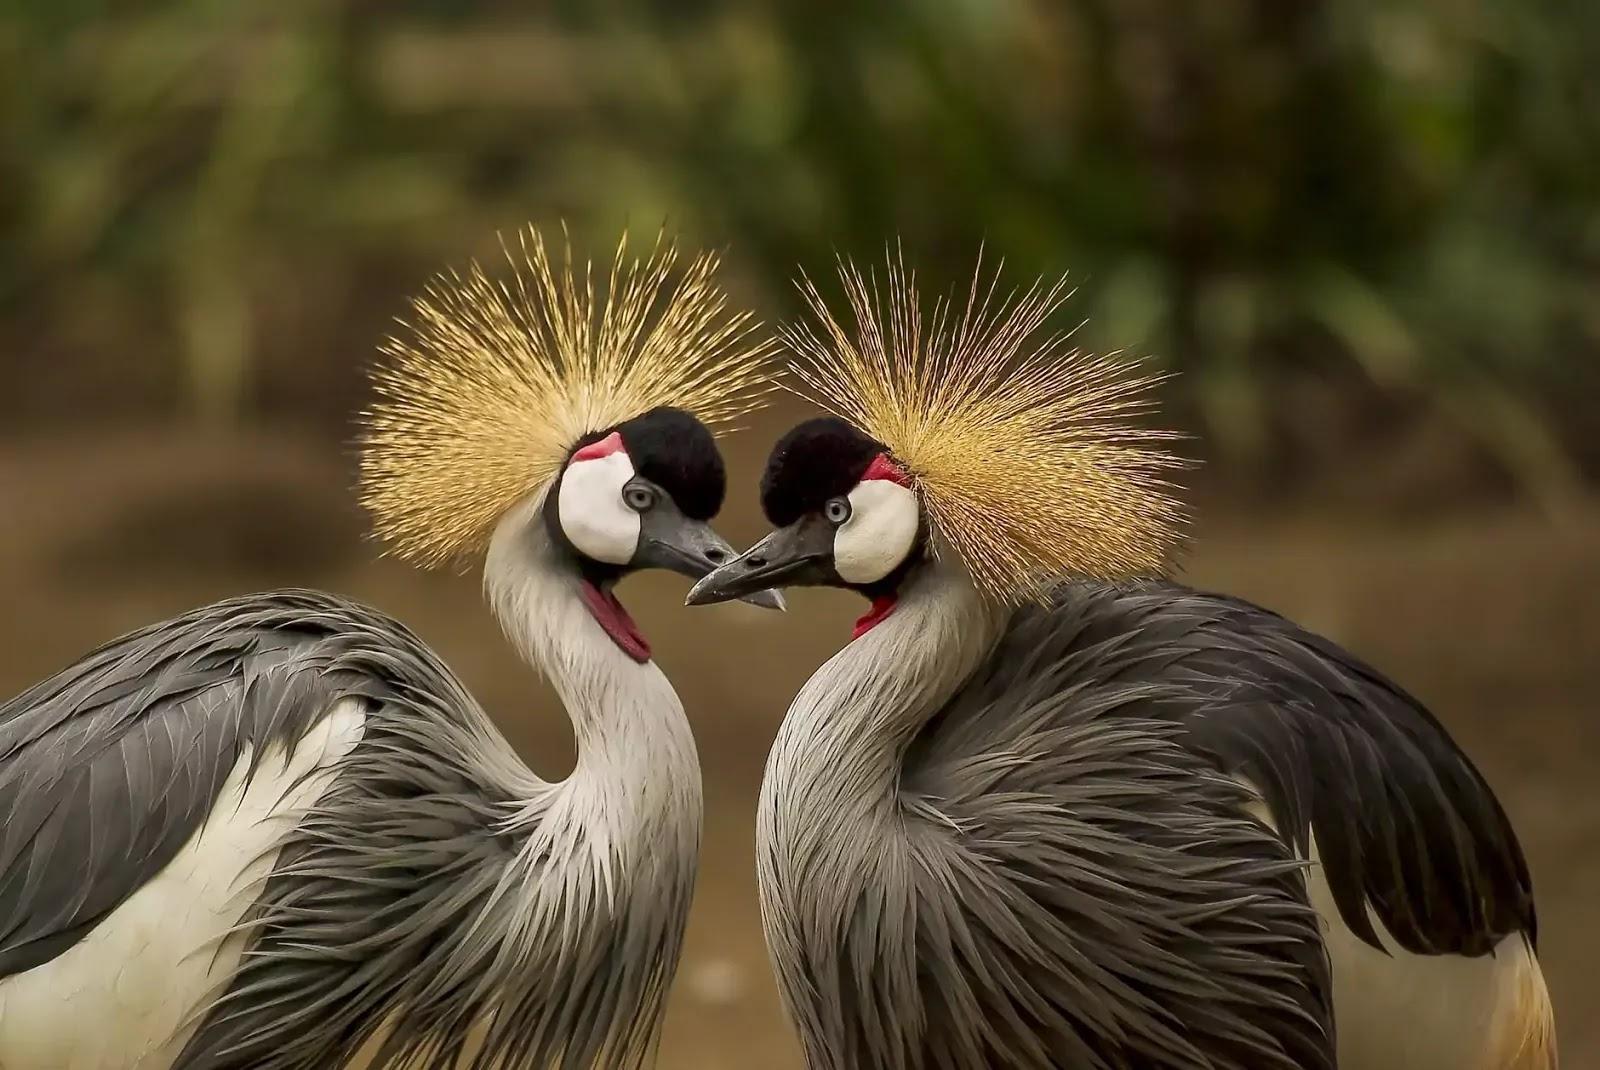 Beautiful birds hd wallpapers download, Cute angry birds hd wallpapers download, Love birds hd wallpapers free download, Beautiful birds hd wallpapers free download, Hd bird wallpaper for pc